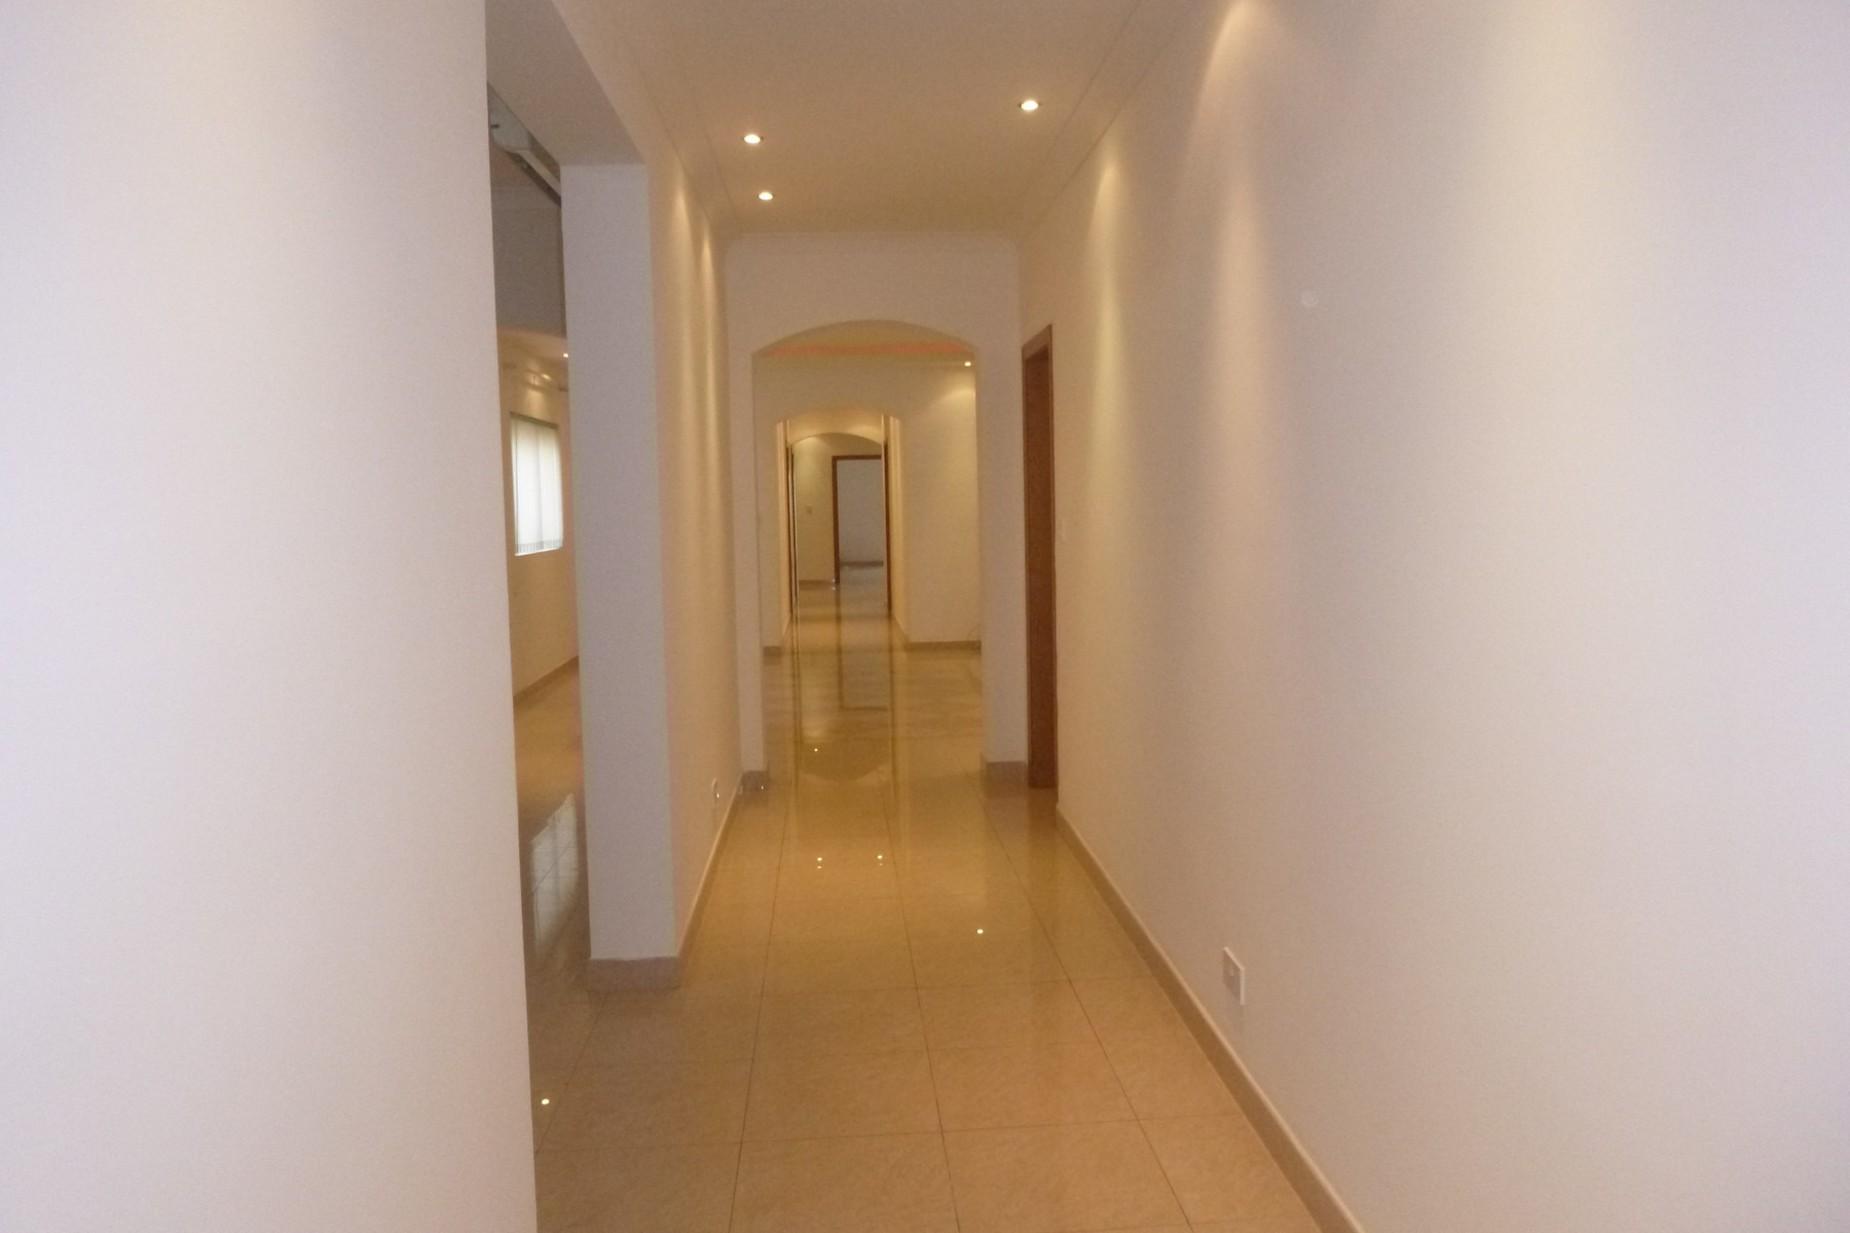 4 bed Apartment For Rent in Sliema, Sliema - thumb 6